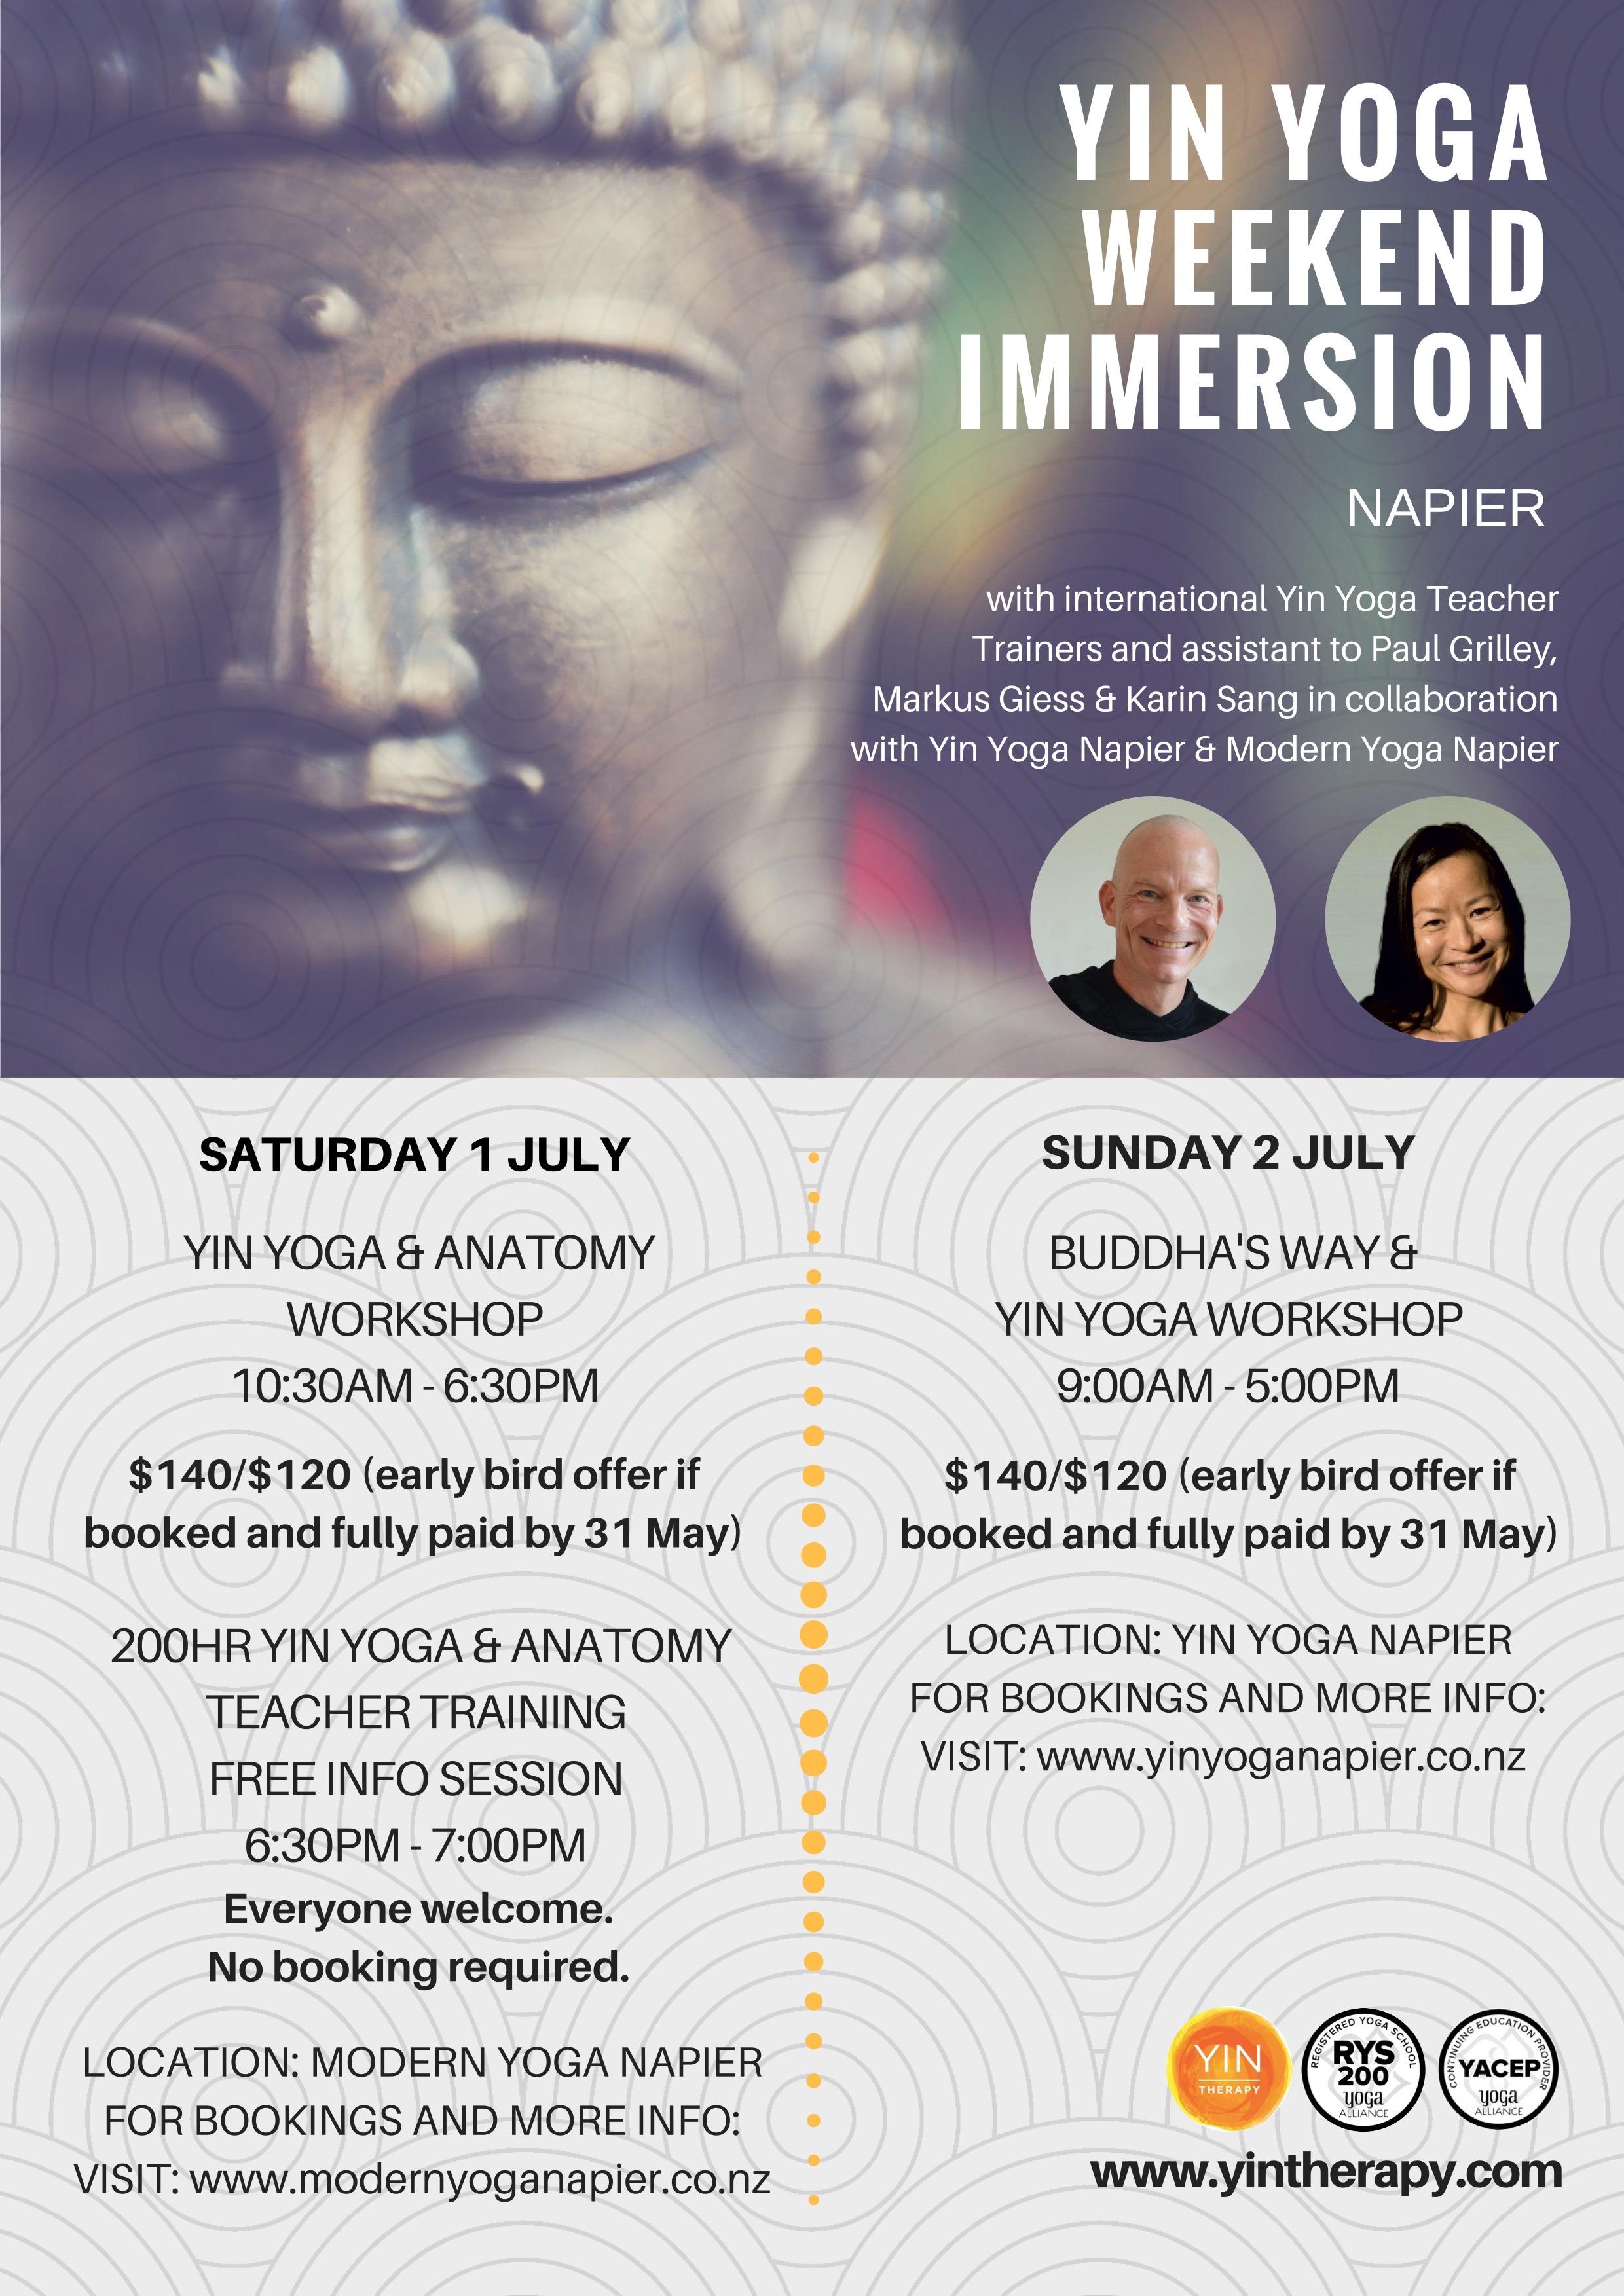 Yin Yoga Weekend Immersion Napier